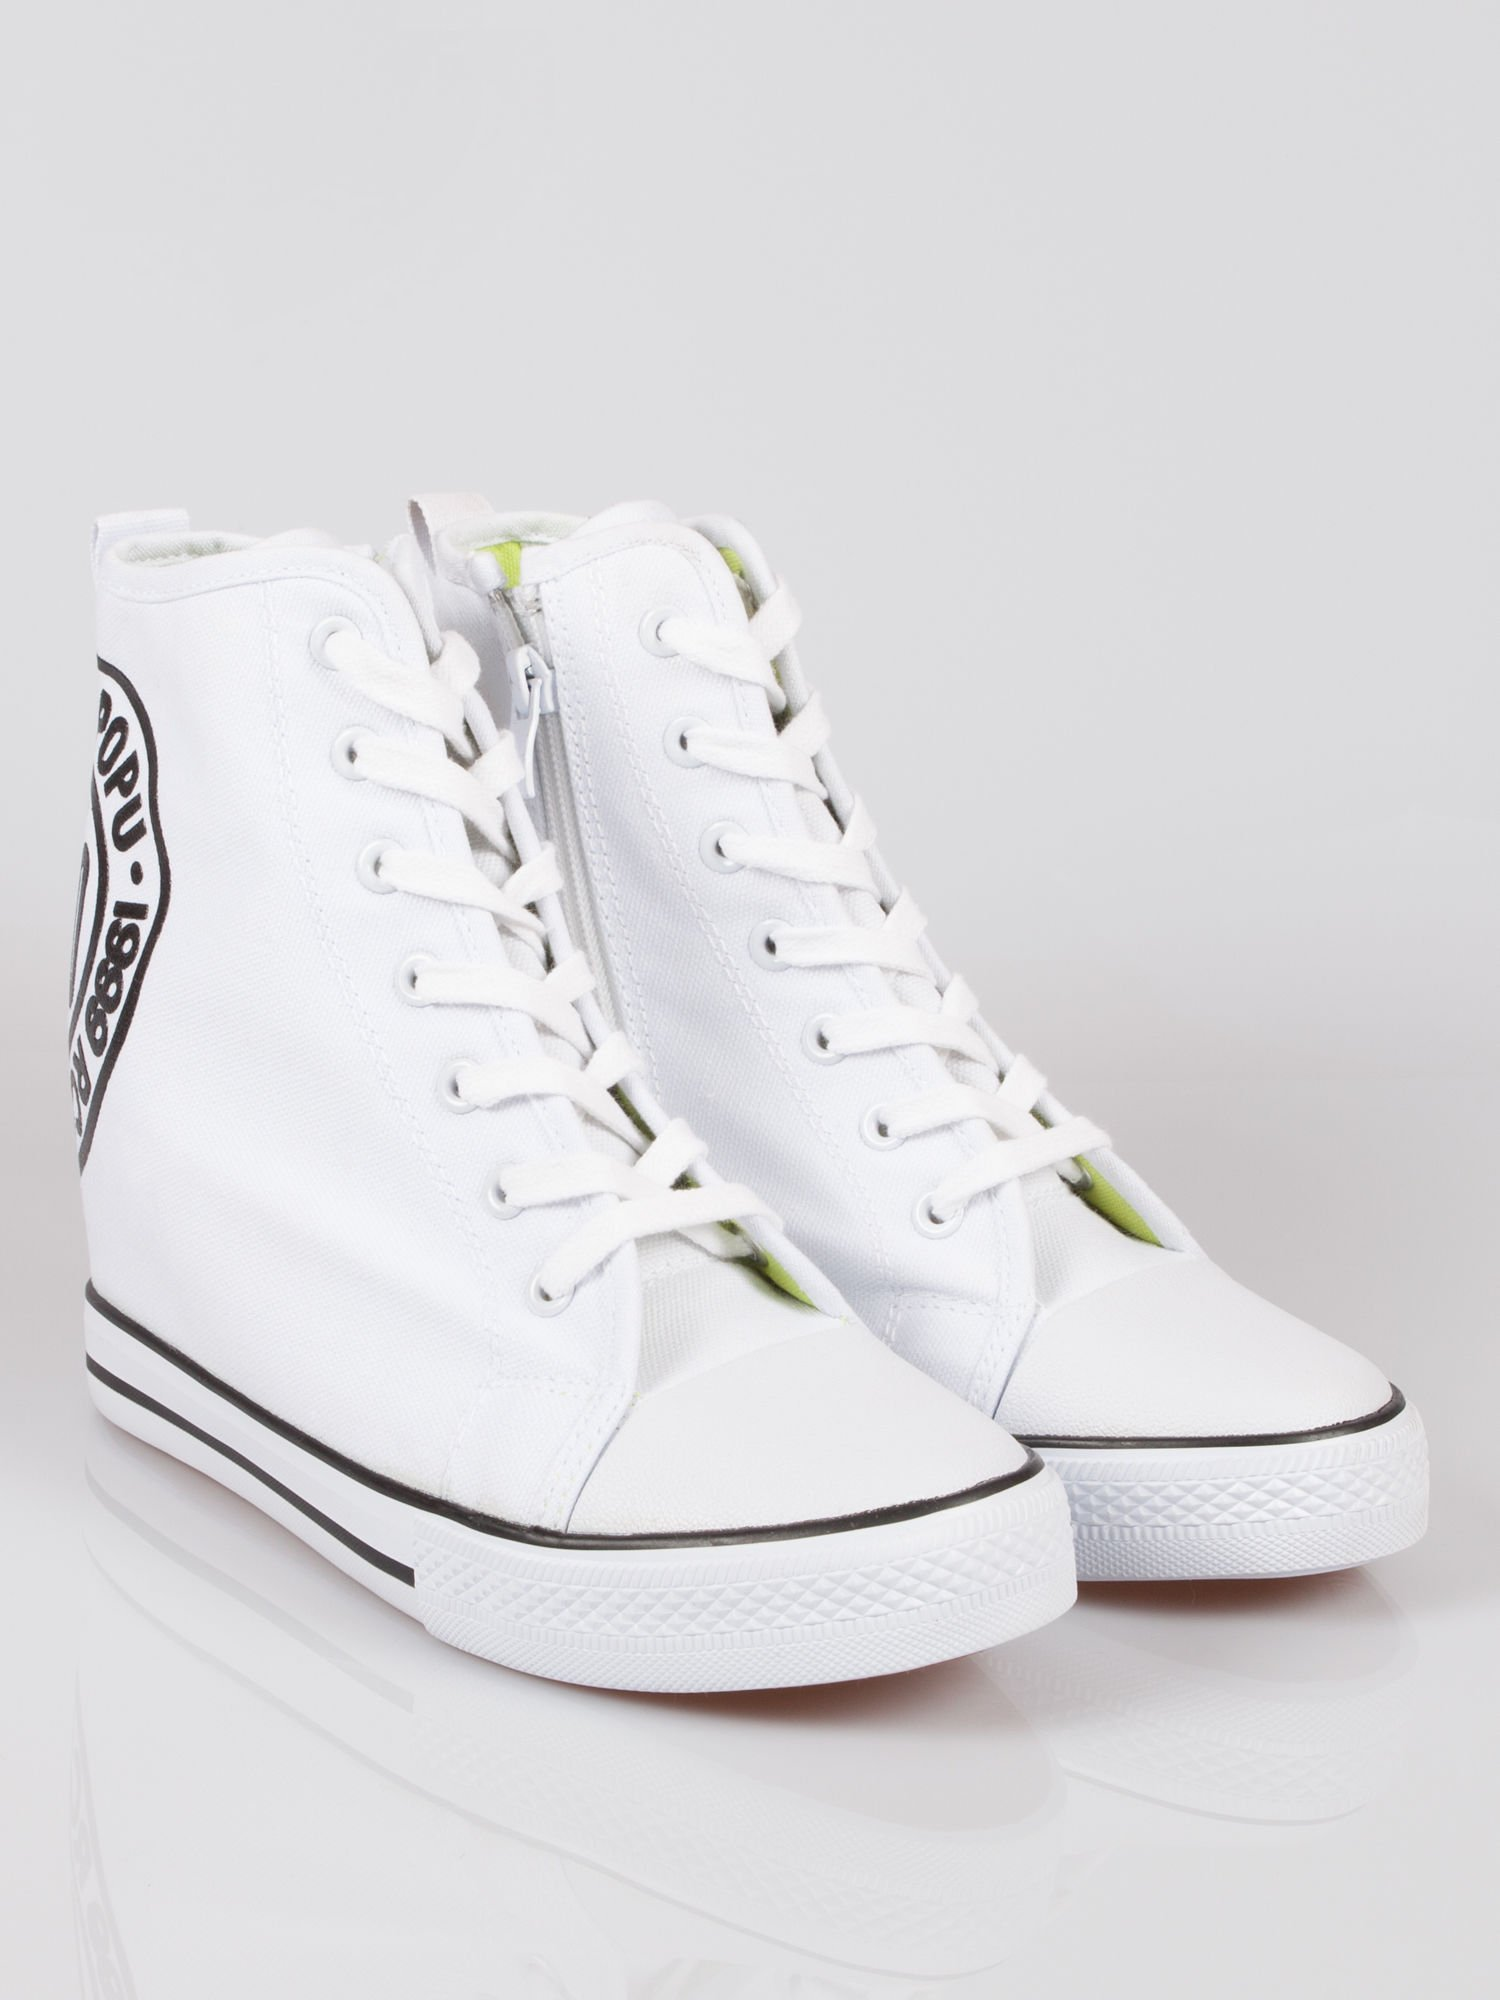 359ef740 Białe trampki na koturnie sneakersy z logo Joann - Buty Sneakersy ...